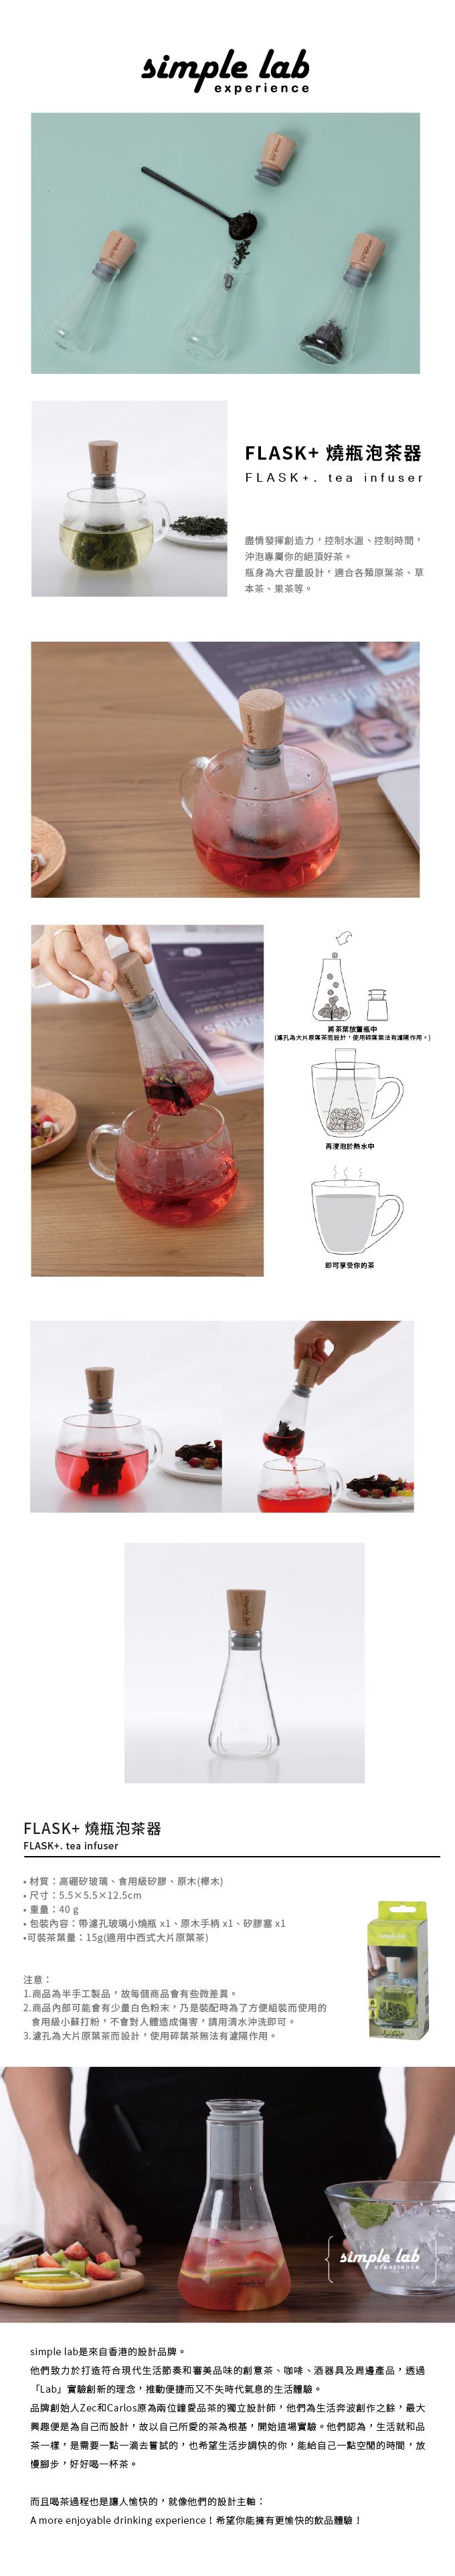 SIMPLE LAB FLASK+ 燒瓶泡茶器